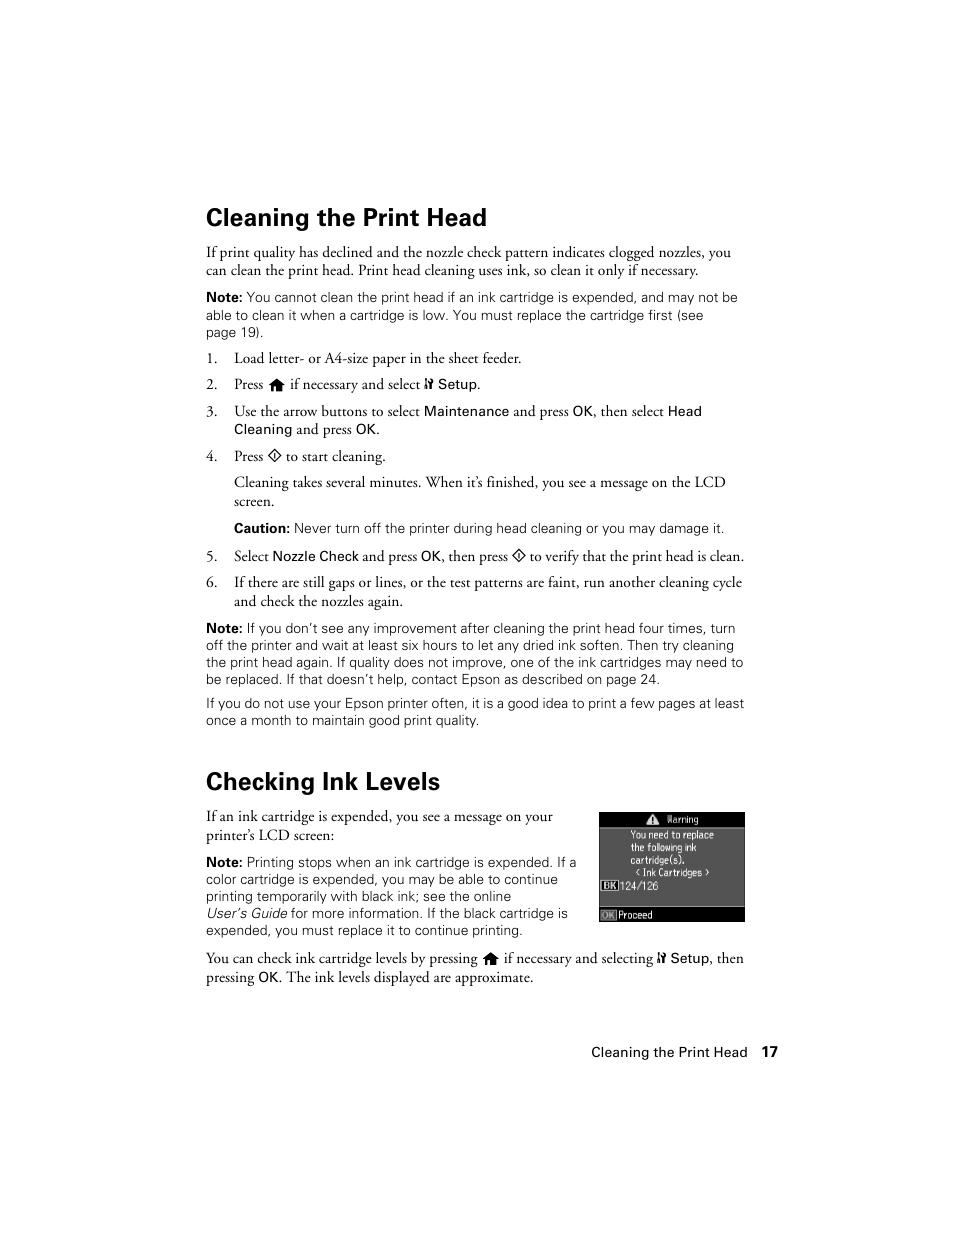 cleaning the print head checking ink levels epson nx430 user rh manualsdir com epson stylus nx430 user guide epson nx430 user guide online